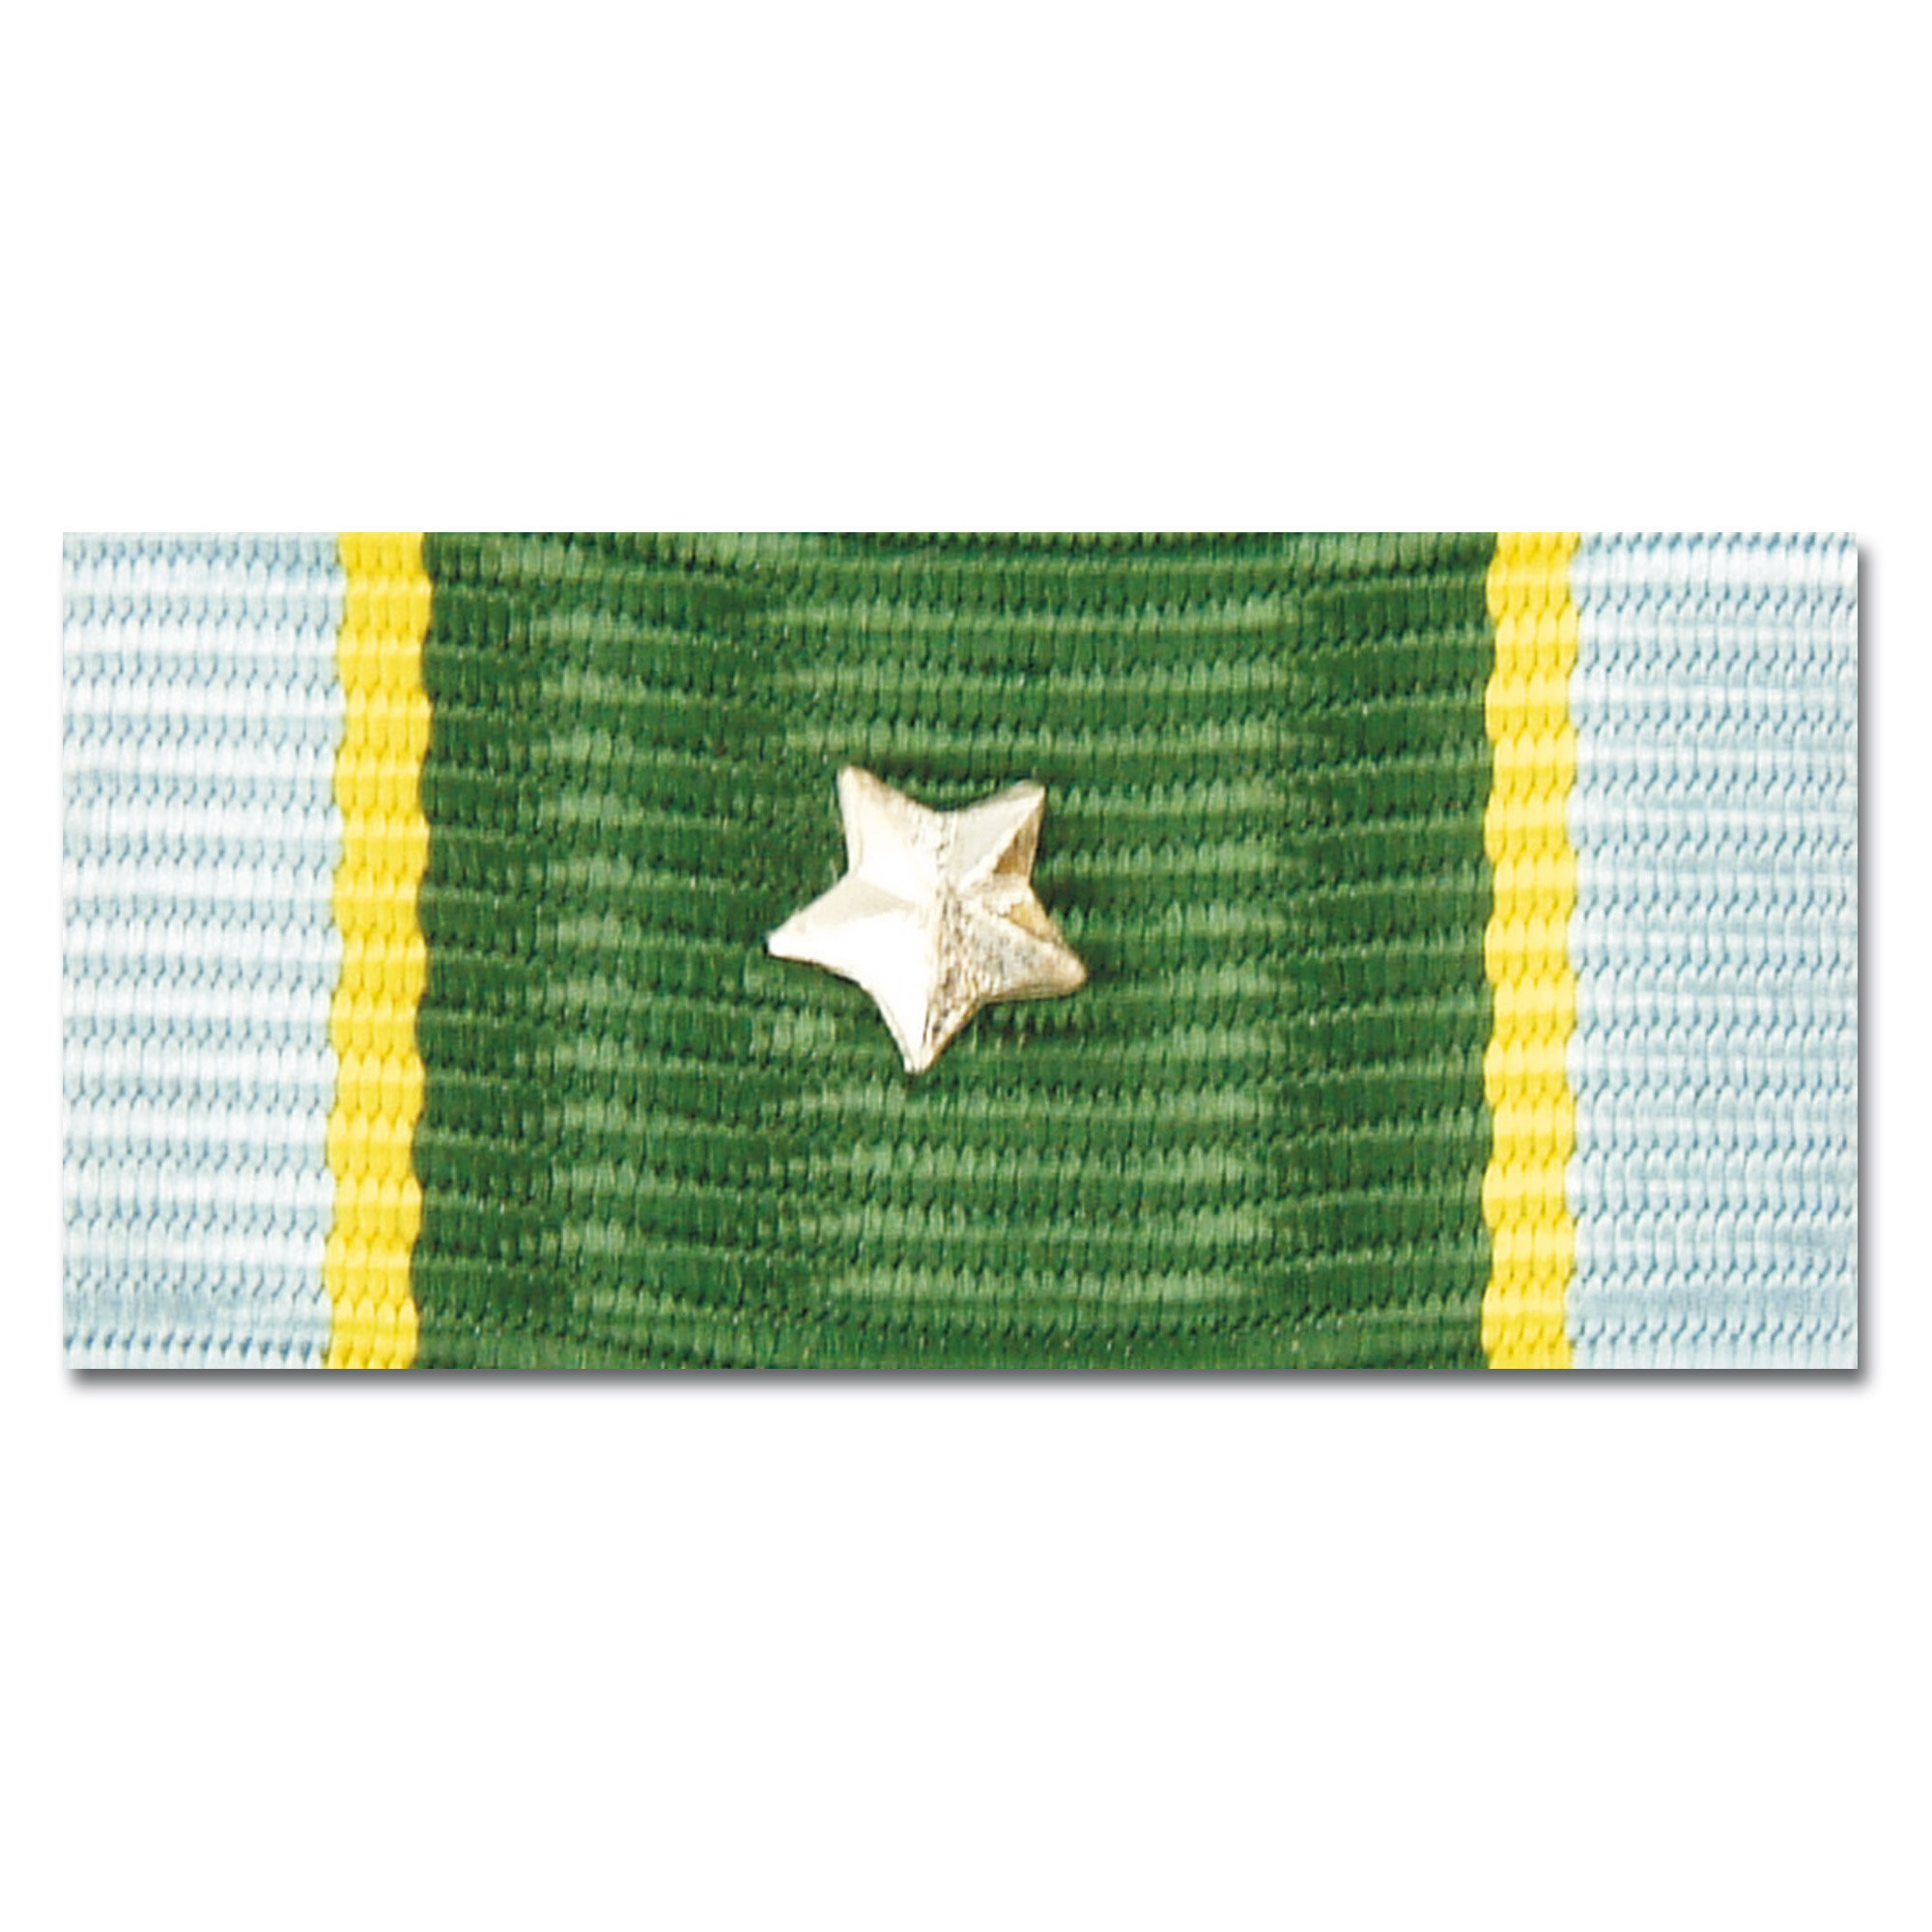 Nastrino premio tiro degli Stati Uniti argento